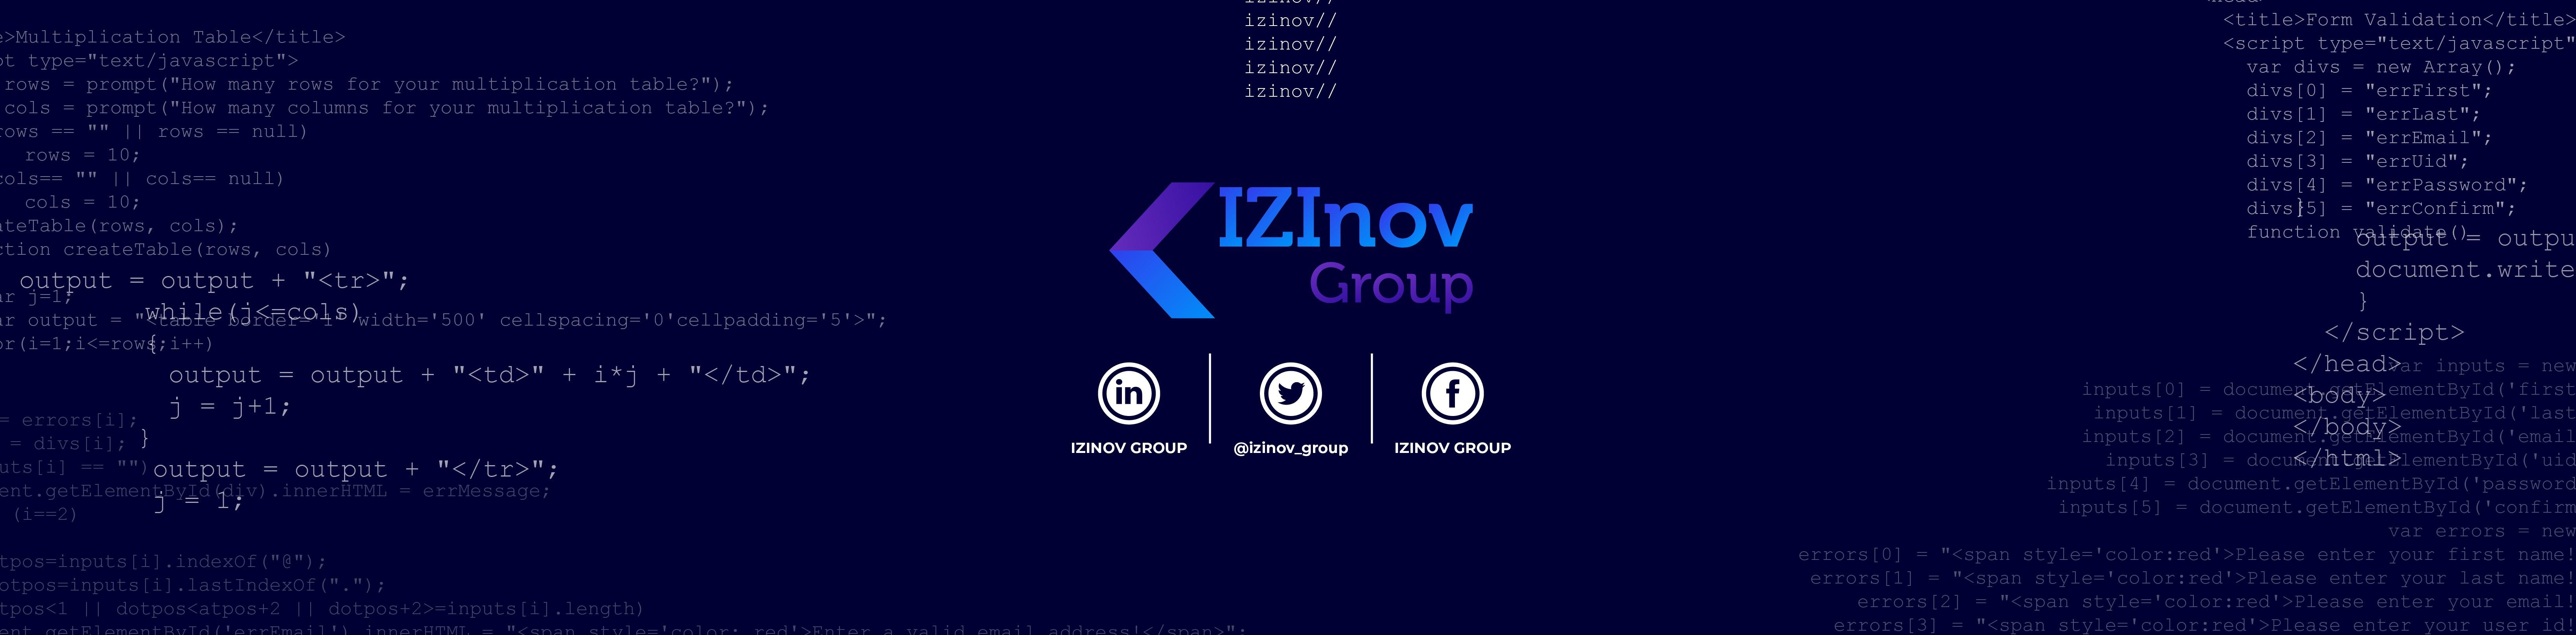 IZInov Group | LinkedIn